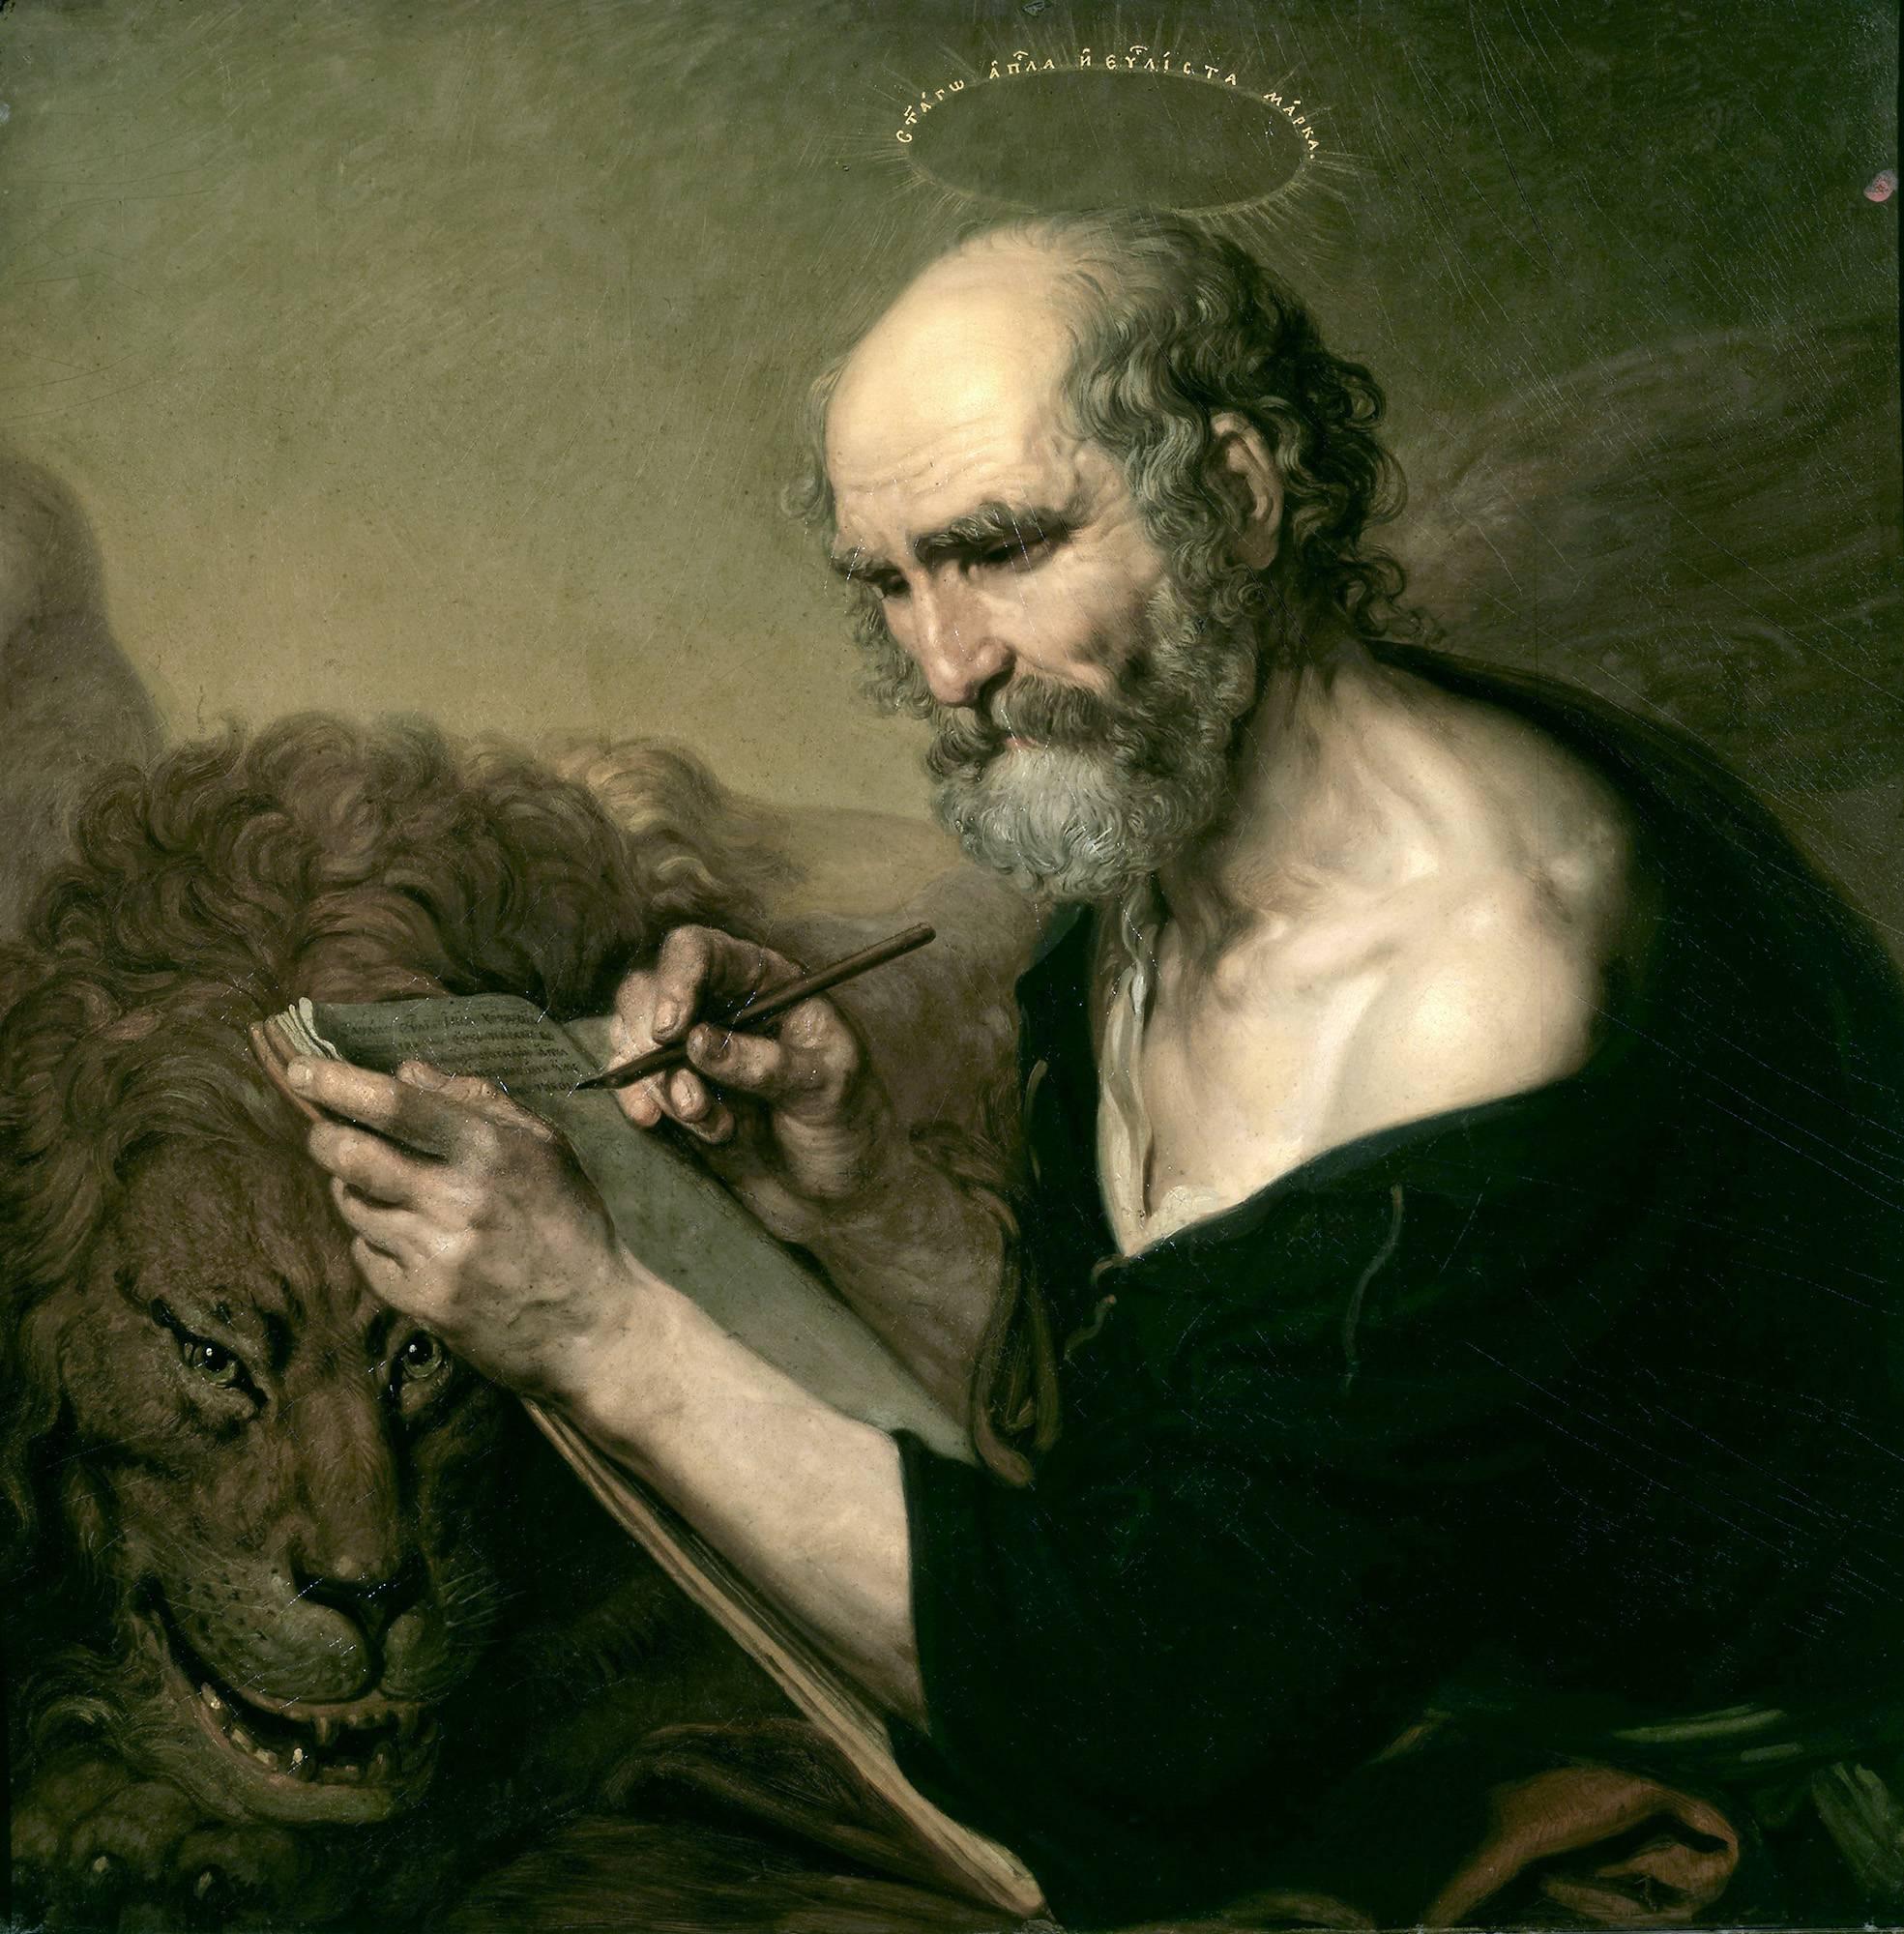 Vangelo del giorno 25 aprile s. Marco Evangelista